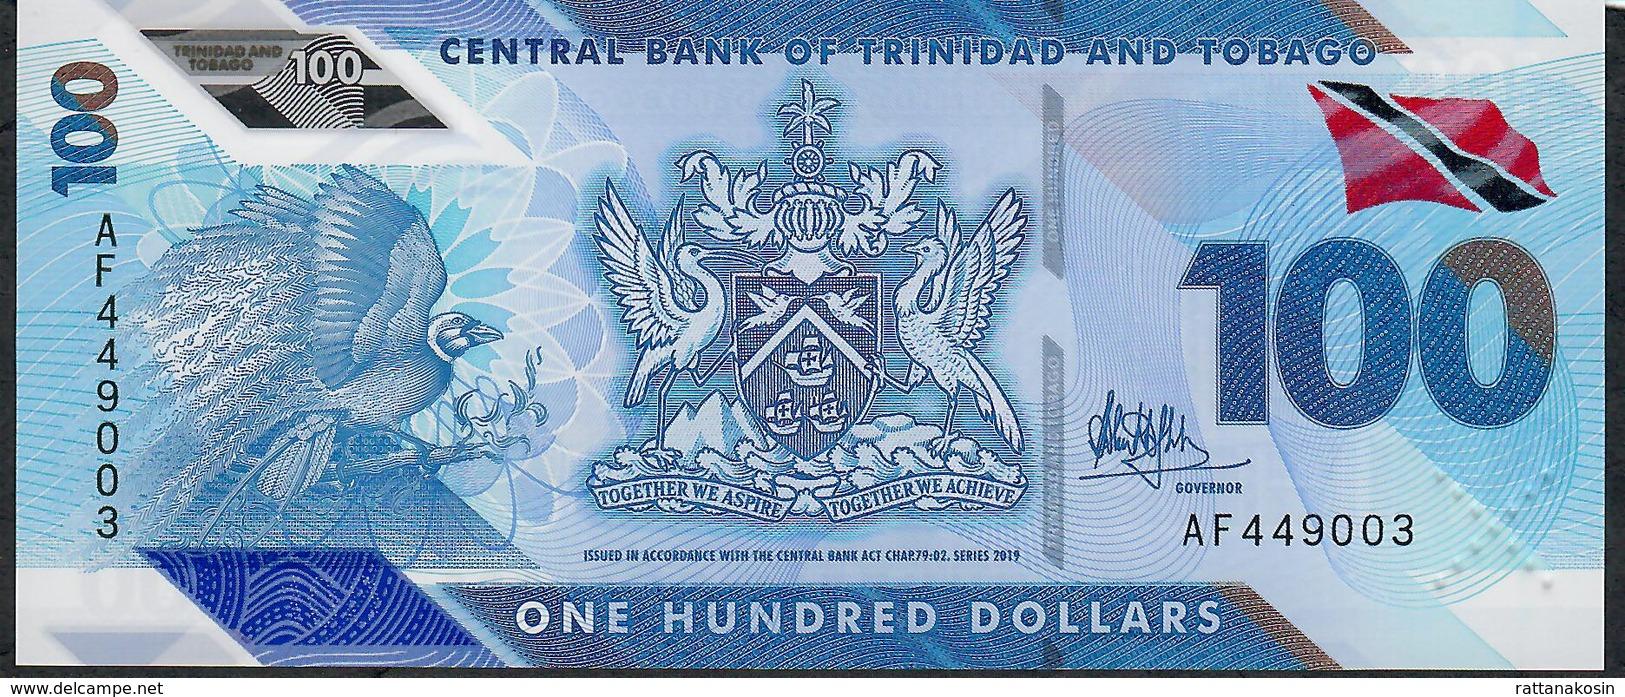 TRINIDAD AND TOBAGO NLP 100 DOLLARS 2019 #AF  POLYMER SUBSTRATE ( Issued December 2019 ) UNC. - Trinidad & Tobago